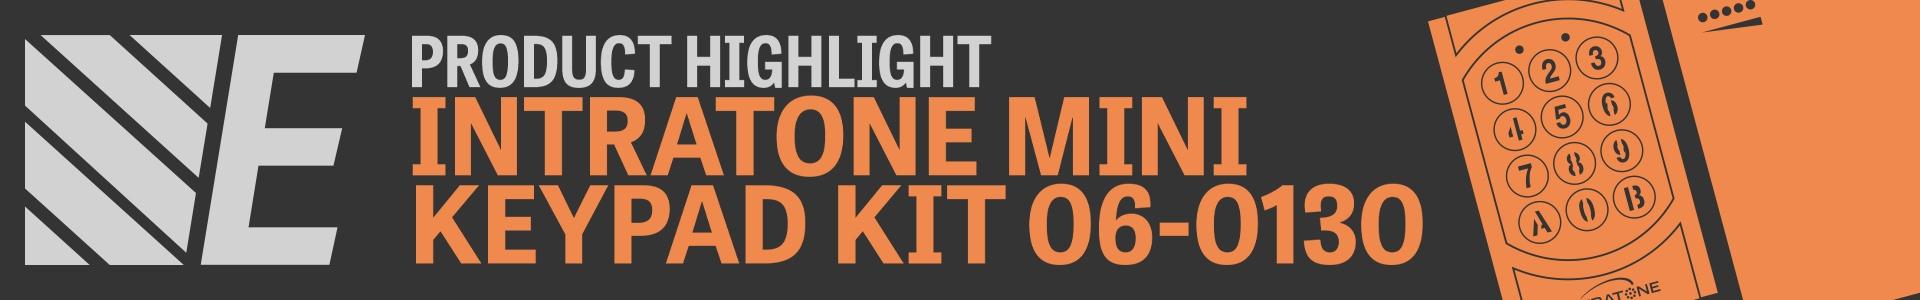 Product Highlight - Intratone Mini Keypad Kit